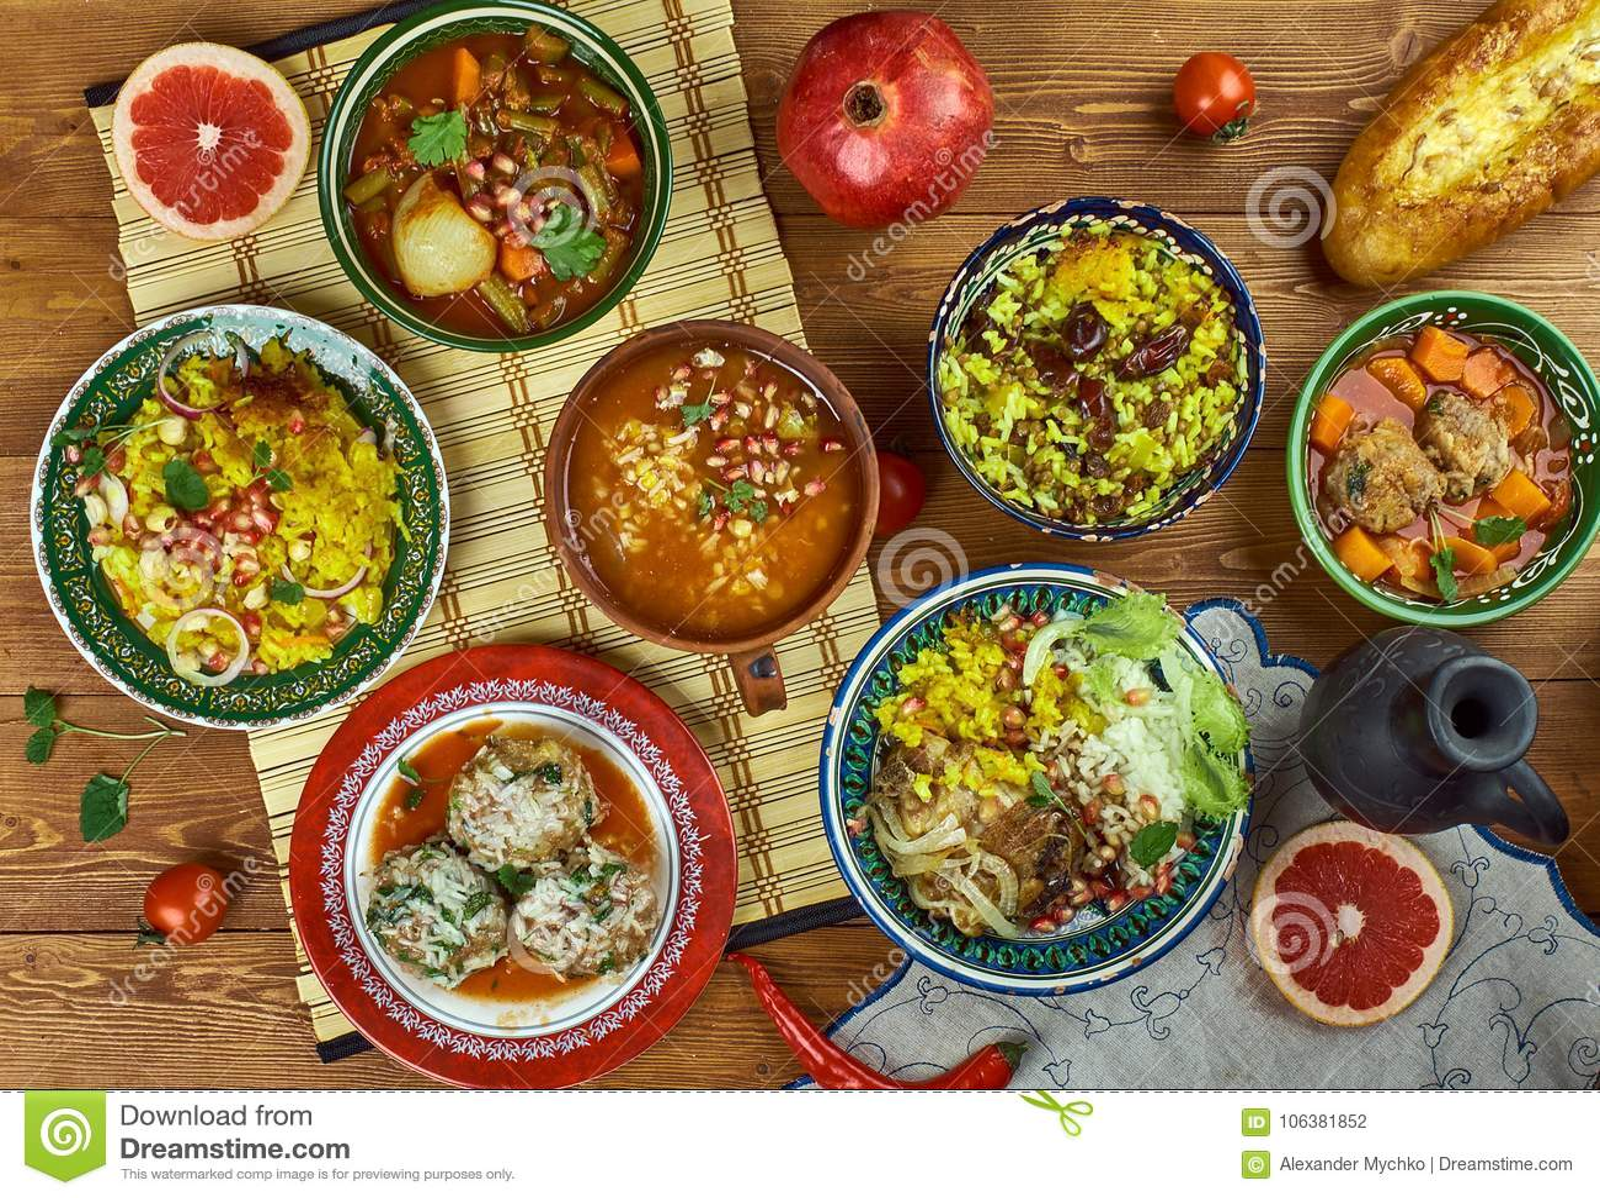 Cuisine Iranienne | Cuisine Iranienne Photo Stock Image Du Adas Assiette 106381852